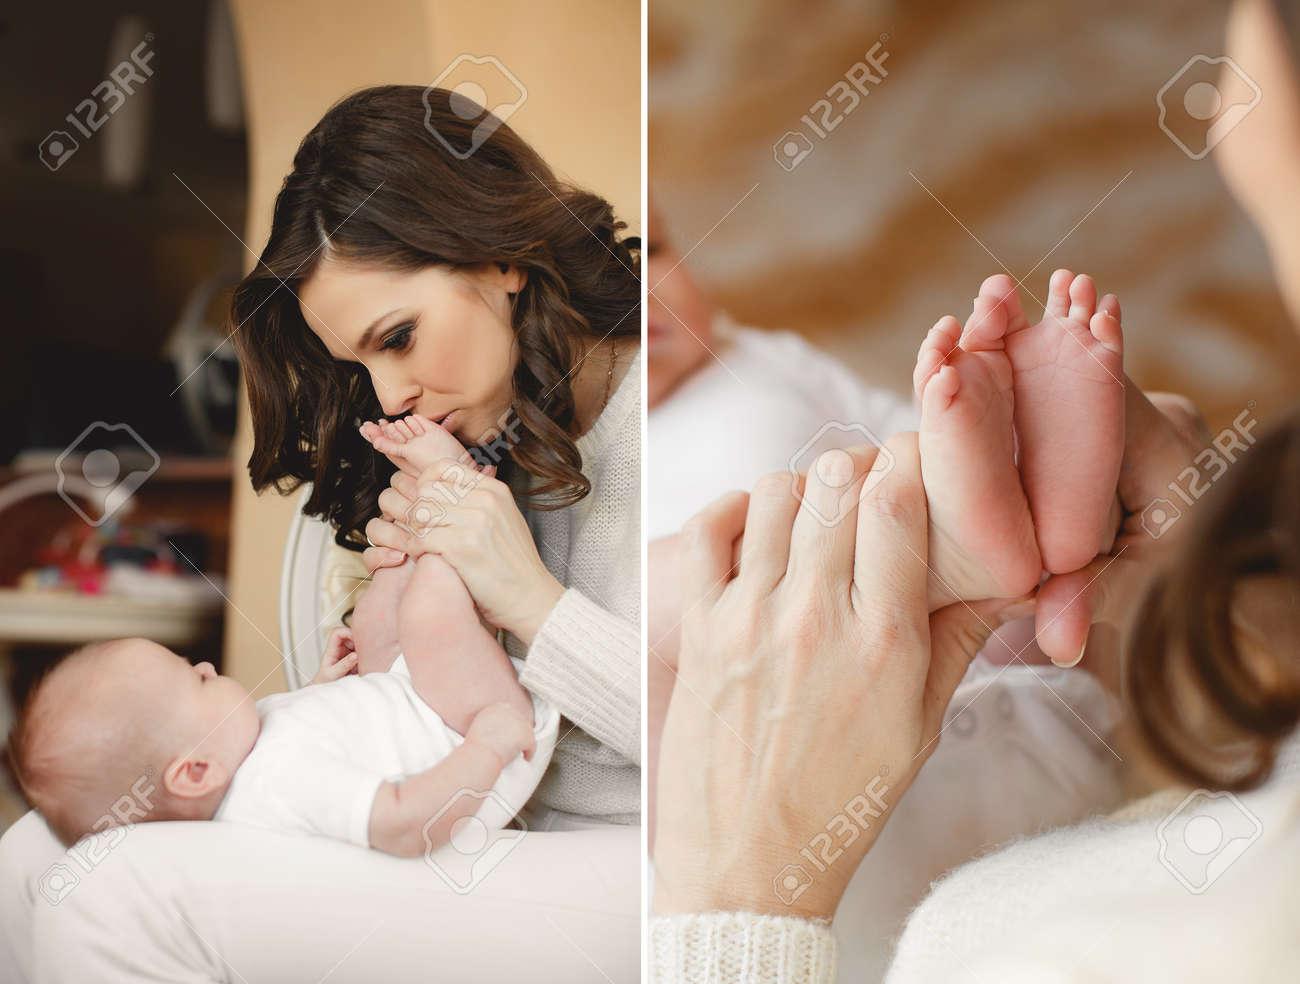 Мама спала сын смотрел